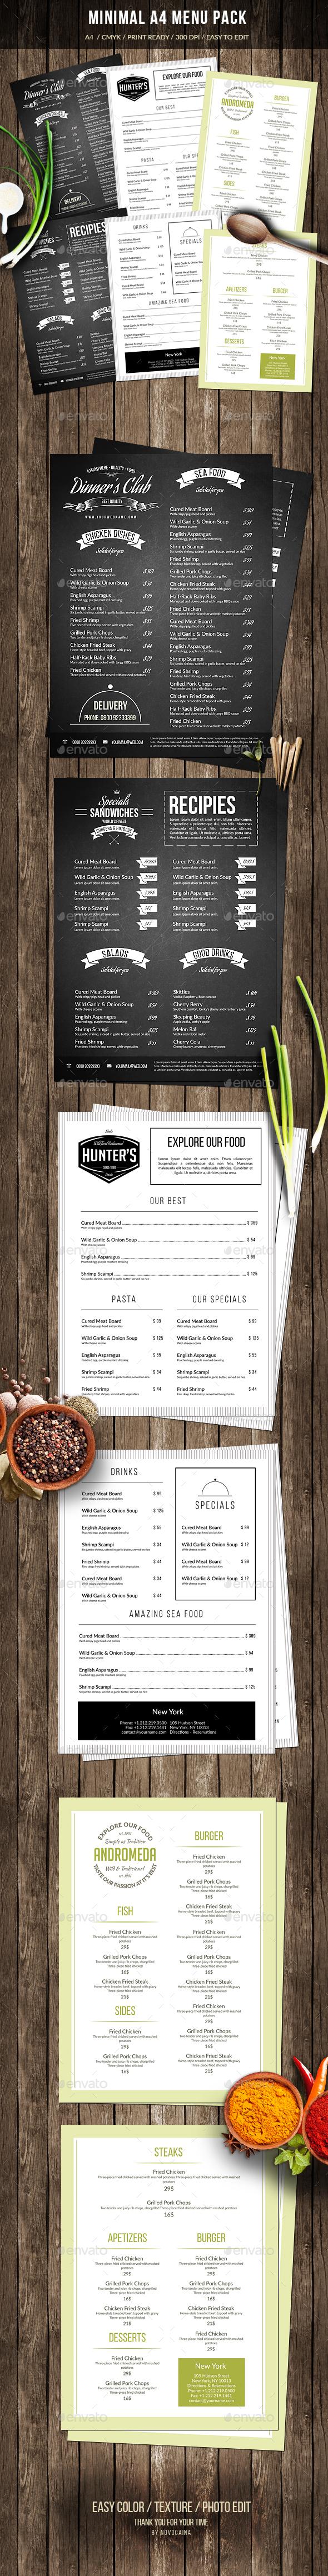 Minimal A4 Menu Pack - Food Menus Print Templates